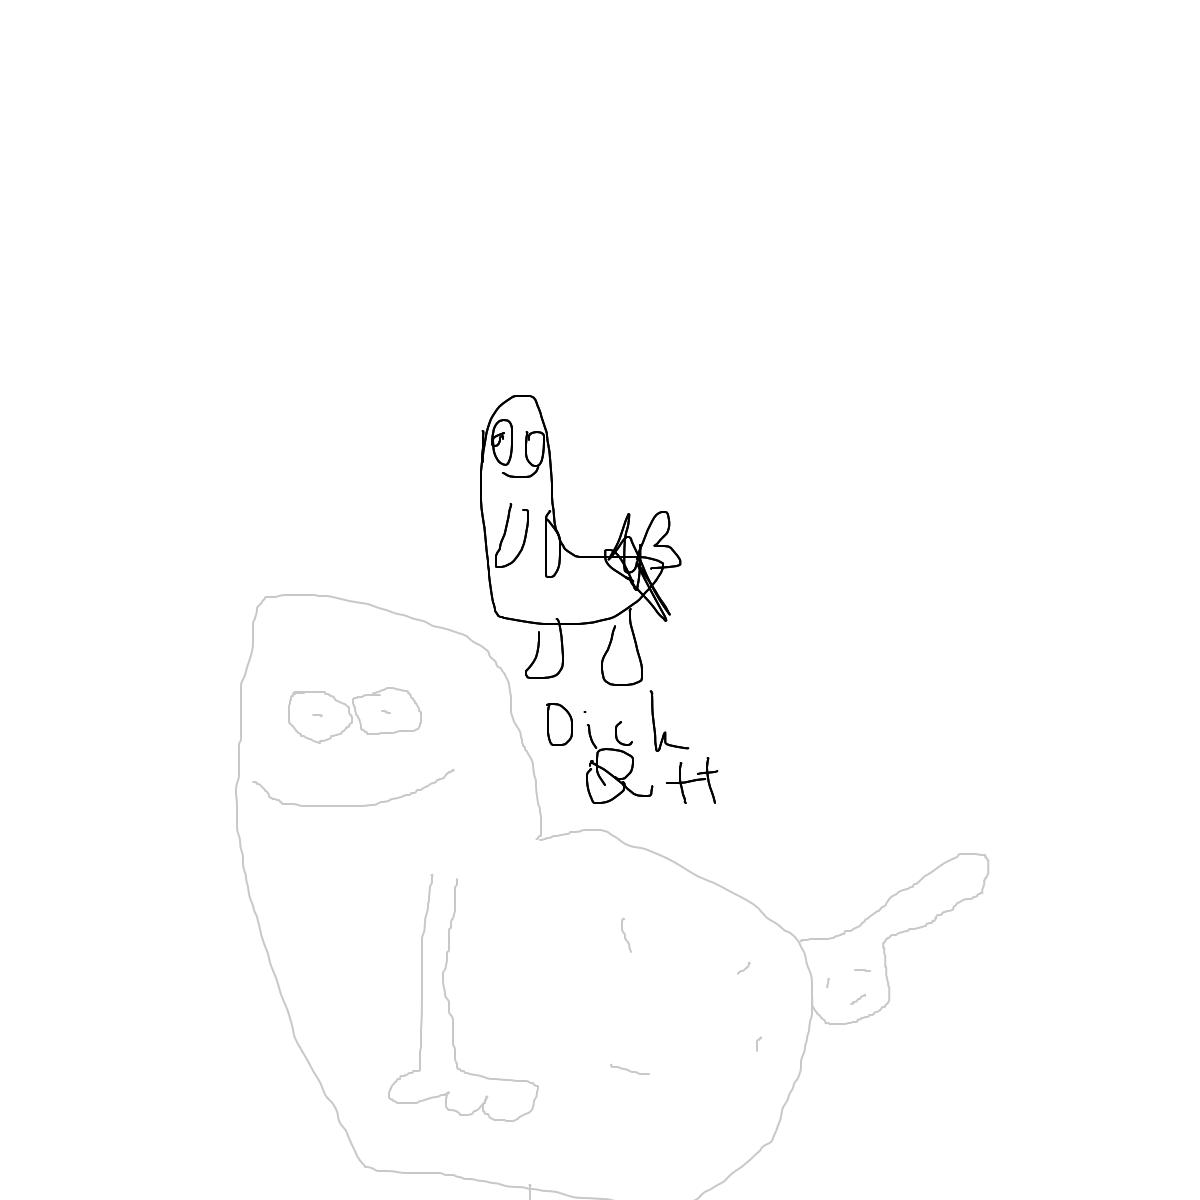 BAAAM drawing#6430 lat:60.4962844848632800lng: -64.7205657958984400